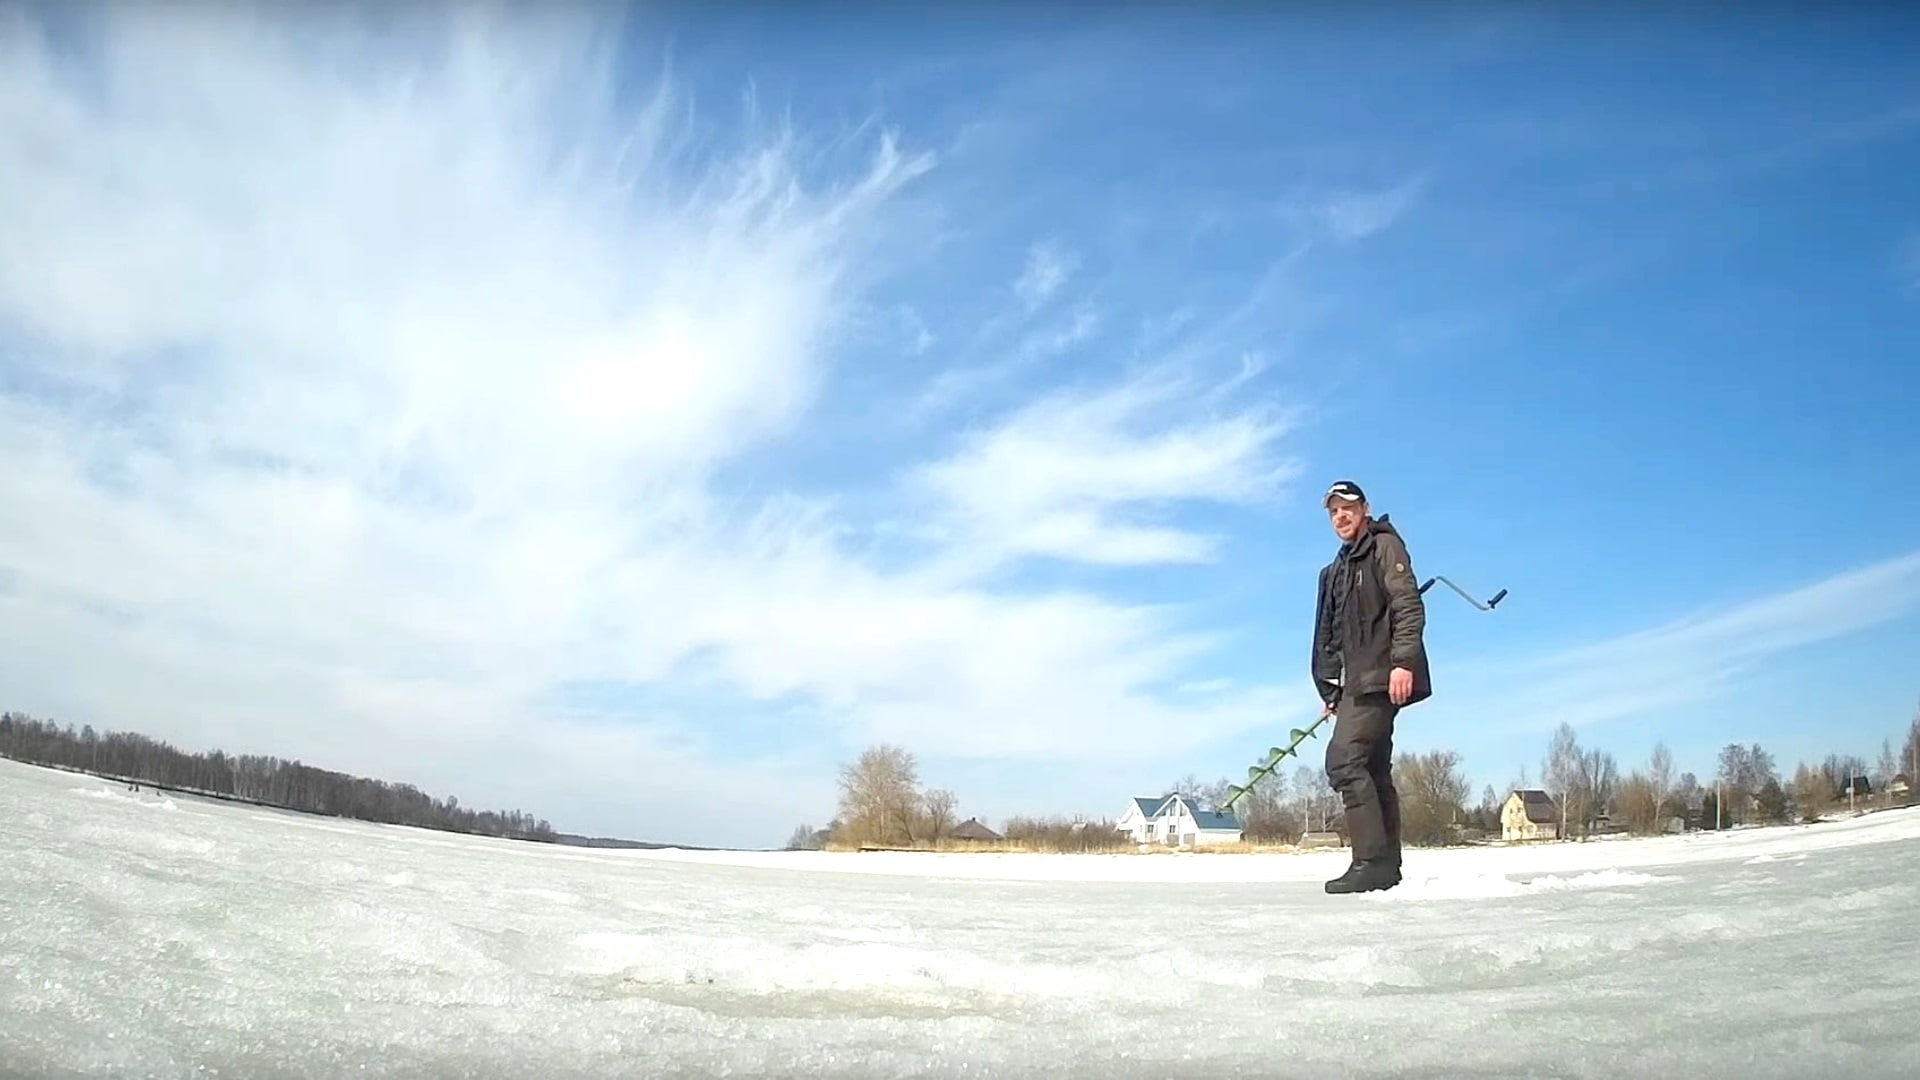 Видеообзор зимнего костюма Aquatic К-02 от Алексея Демидовича